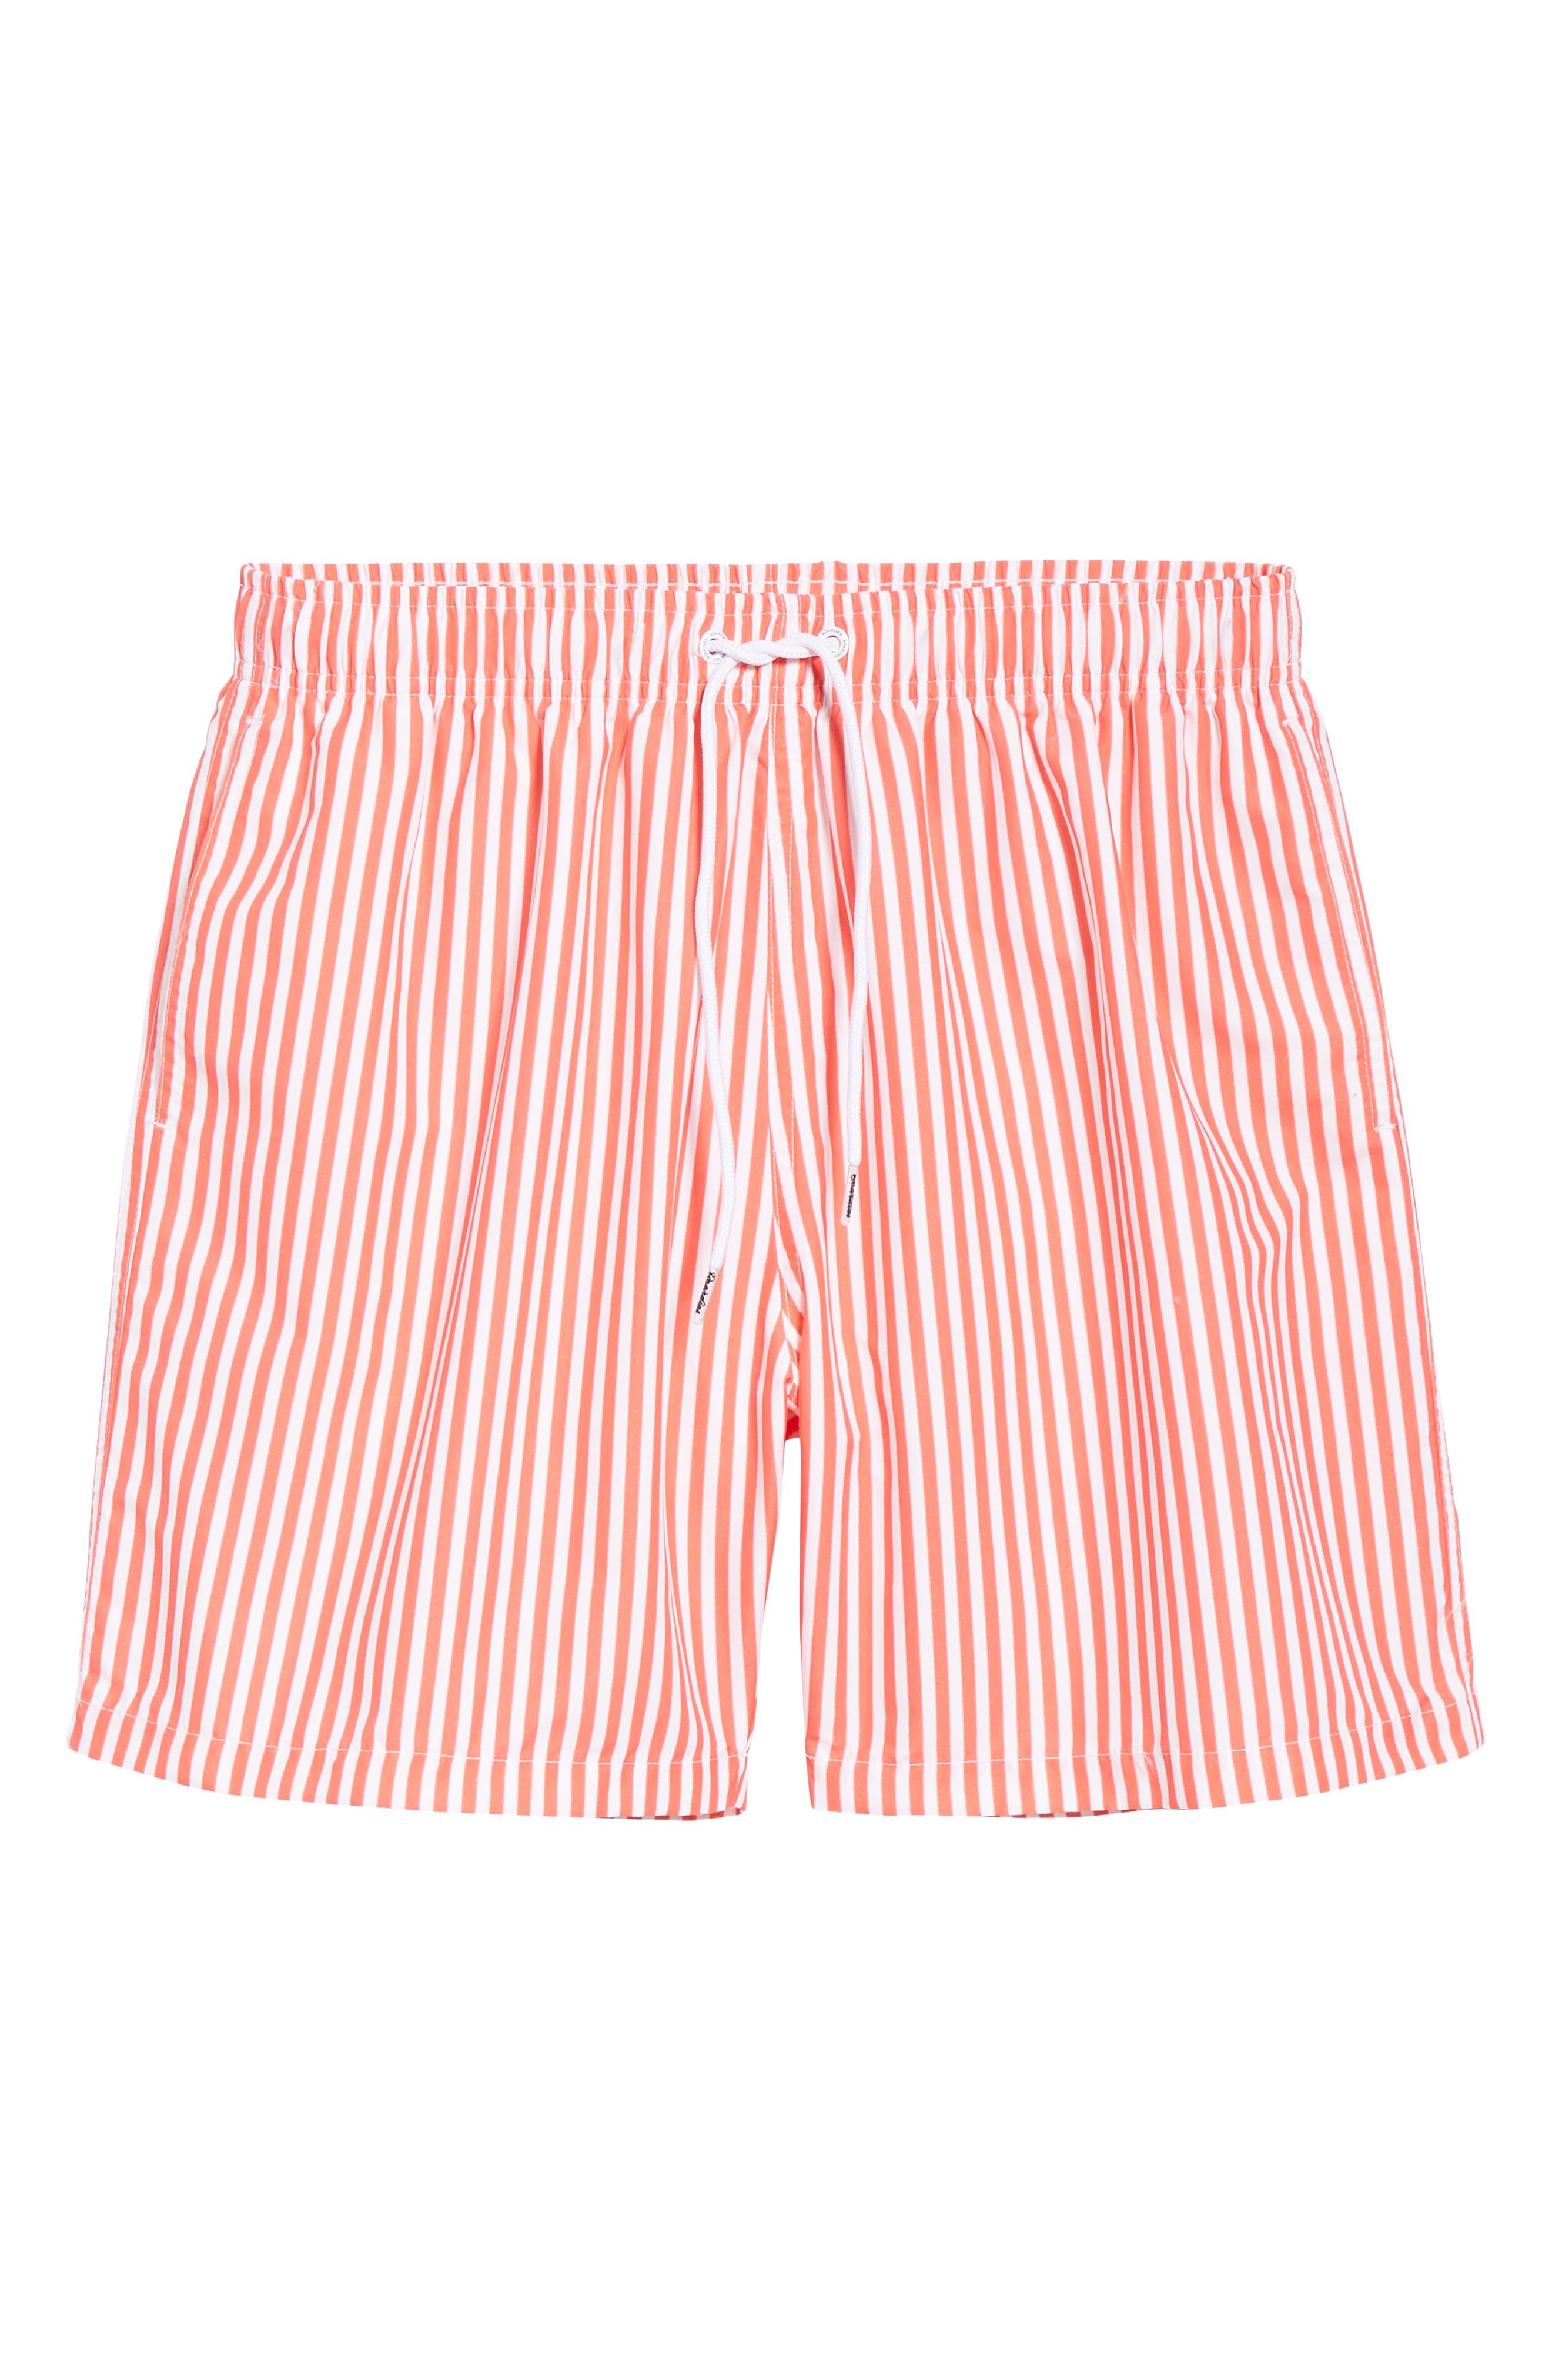 Deck Stripes Swim Trunks,                             Alternate thumbnail 6, color,                             PINK